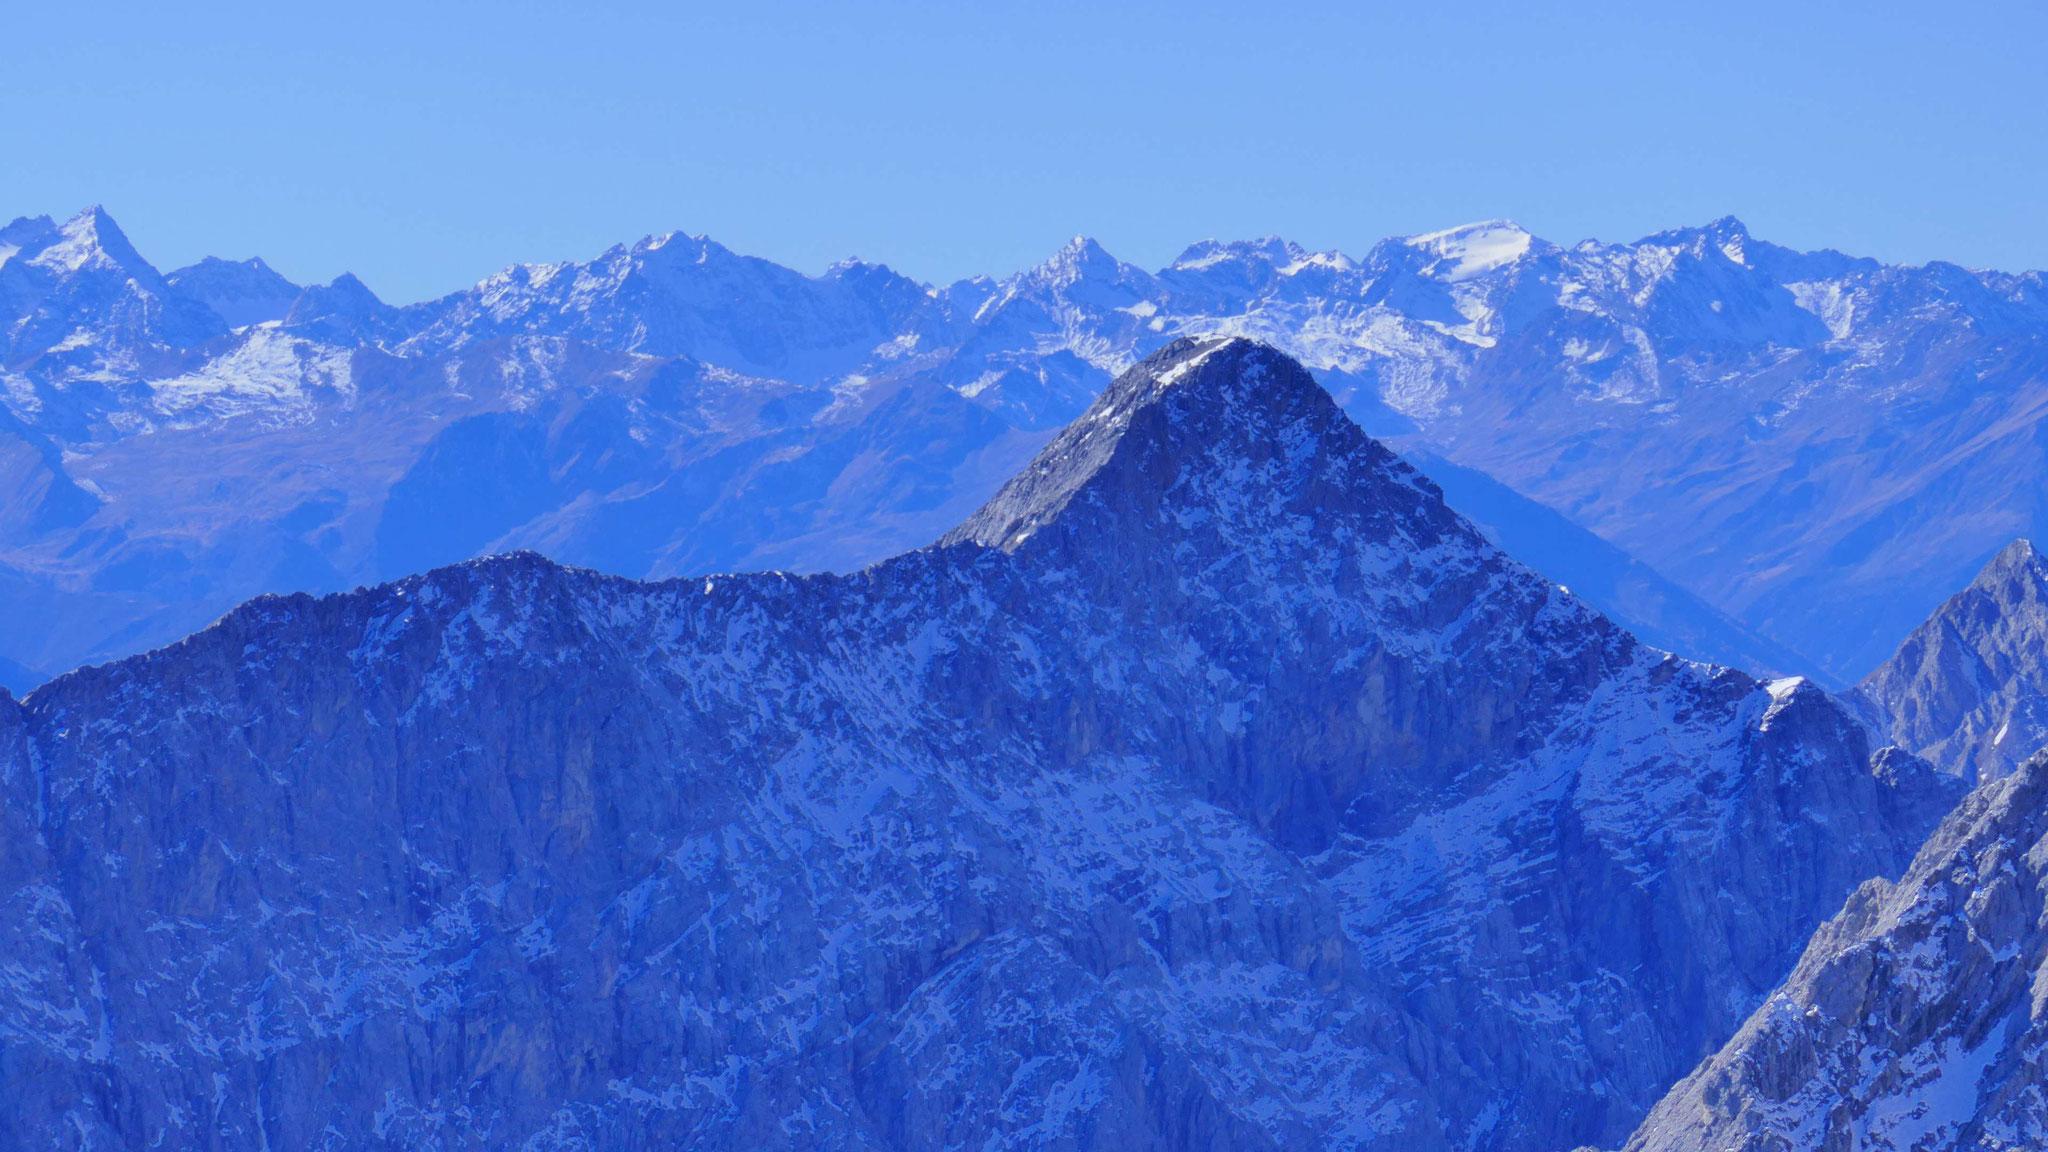 Stubaier Alpen hinter der Speckkarspitze